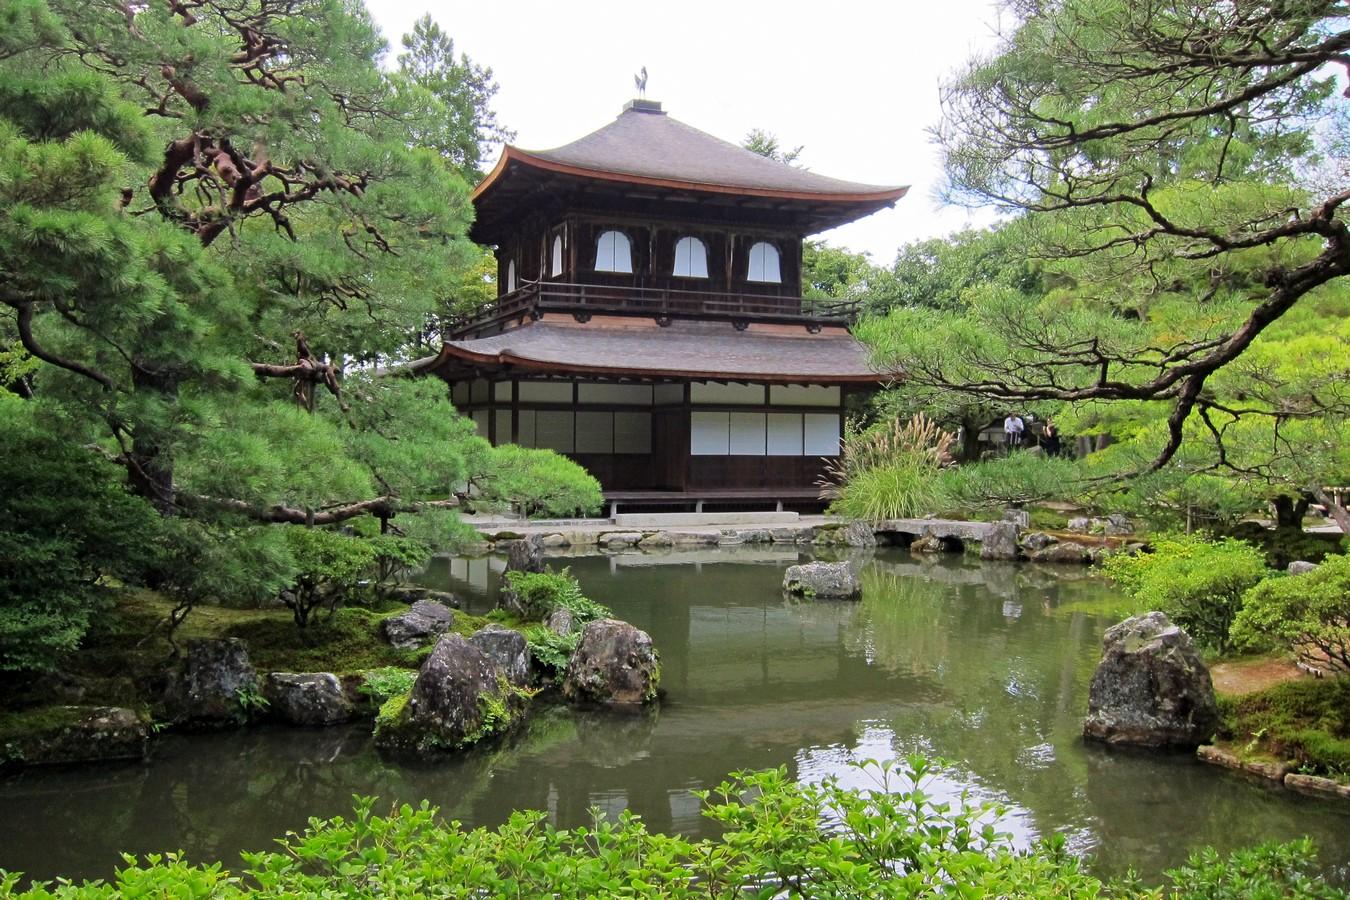 Shoin-zukuri Architecture: Japanese residential architecture - Sheet10